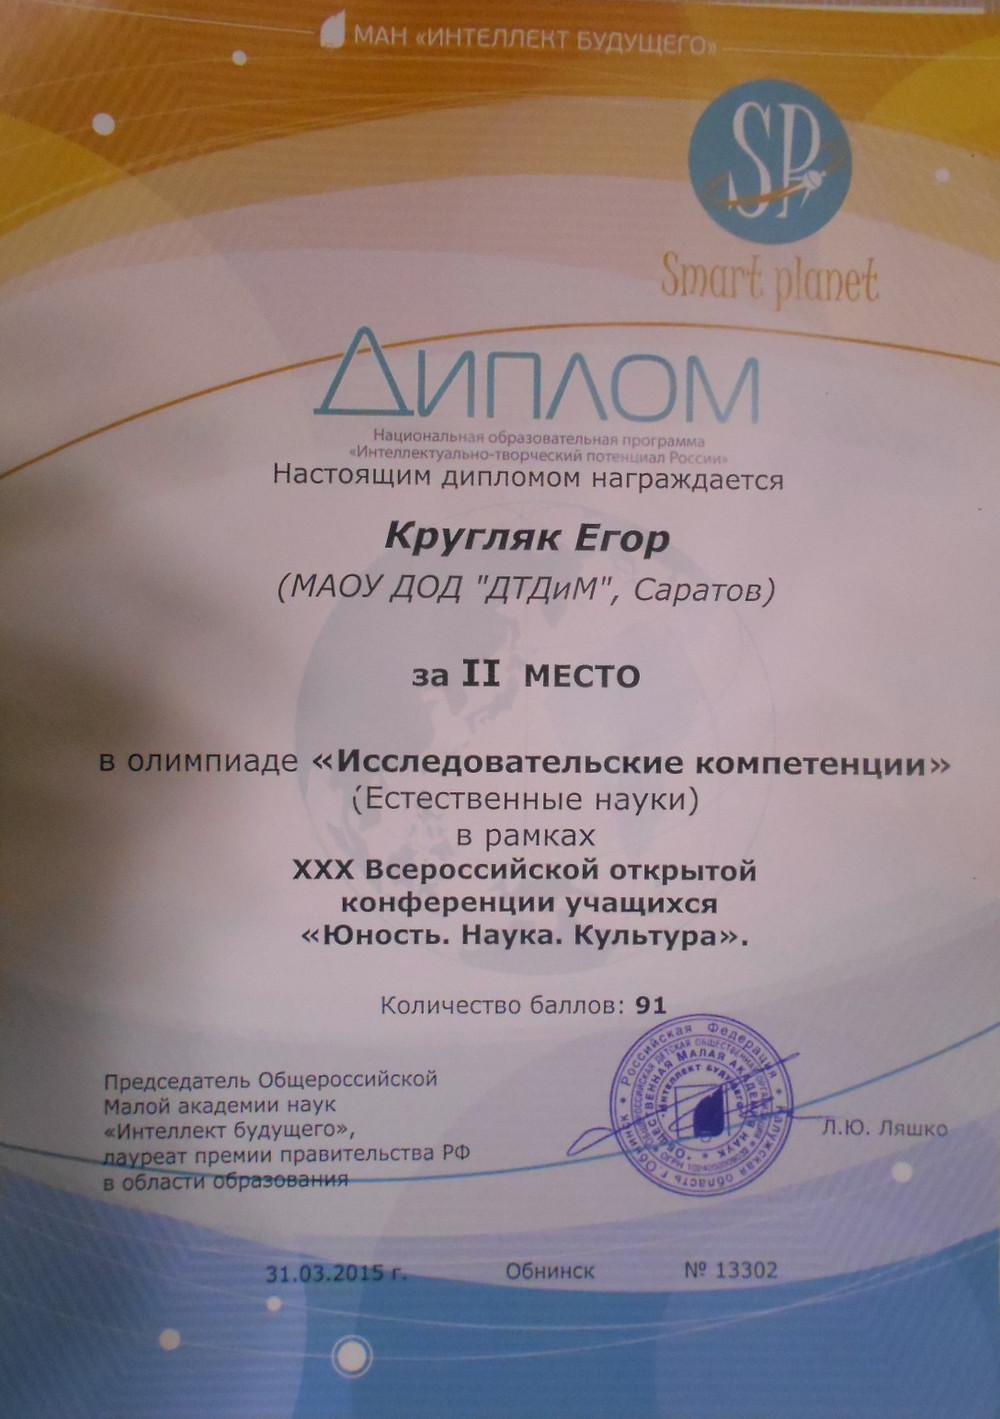 Кругляк Егор 2 место 31 марта 2015.JPG